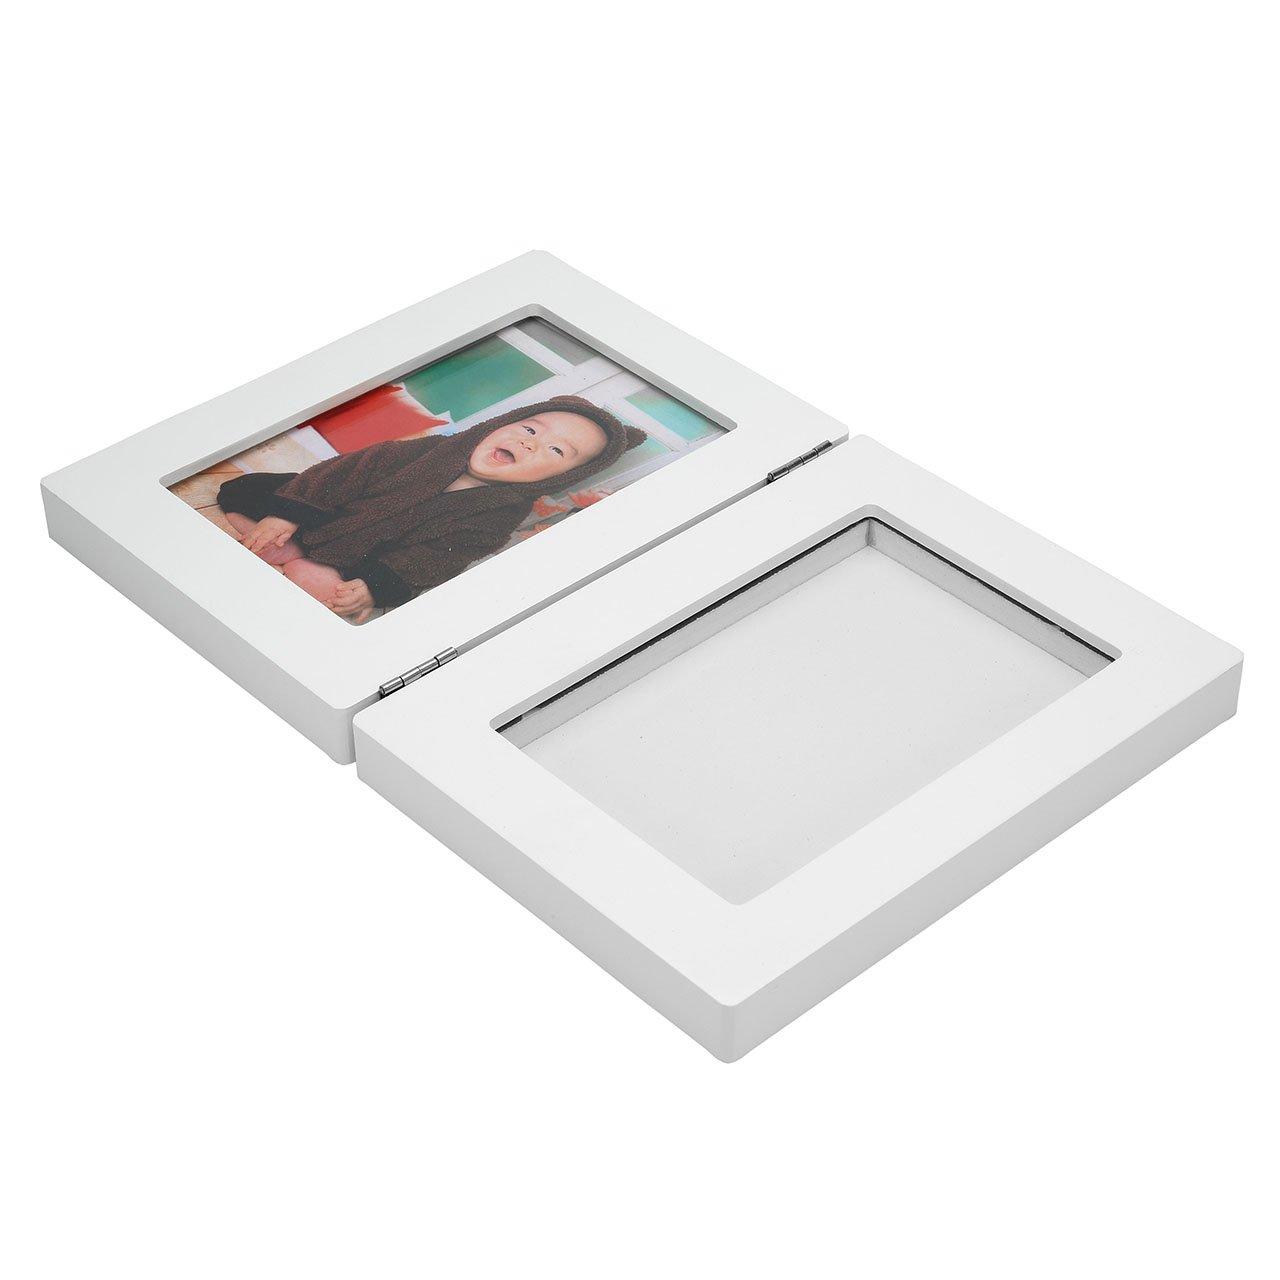 Mogoko Baby Teeth Storage Box and Footprint Picture Frame Kit Wooden Souvenir Bundle Set for Baby Girl by Mogoko (Image #7)